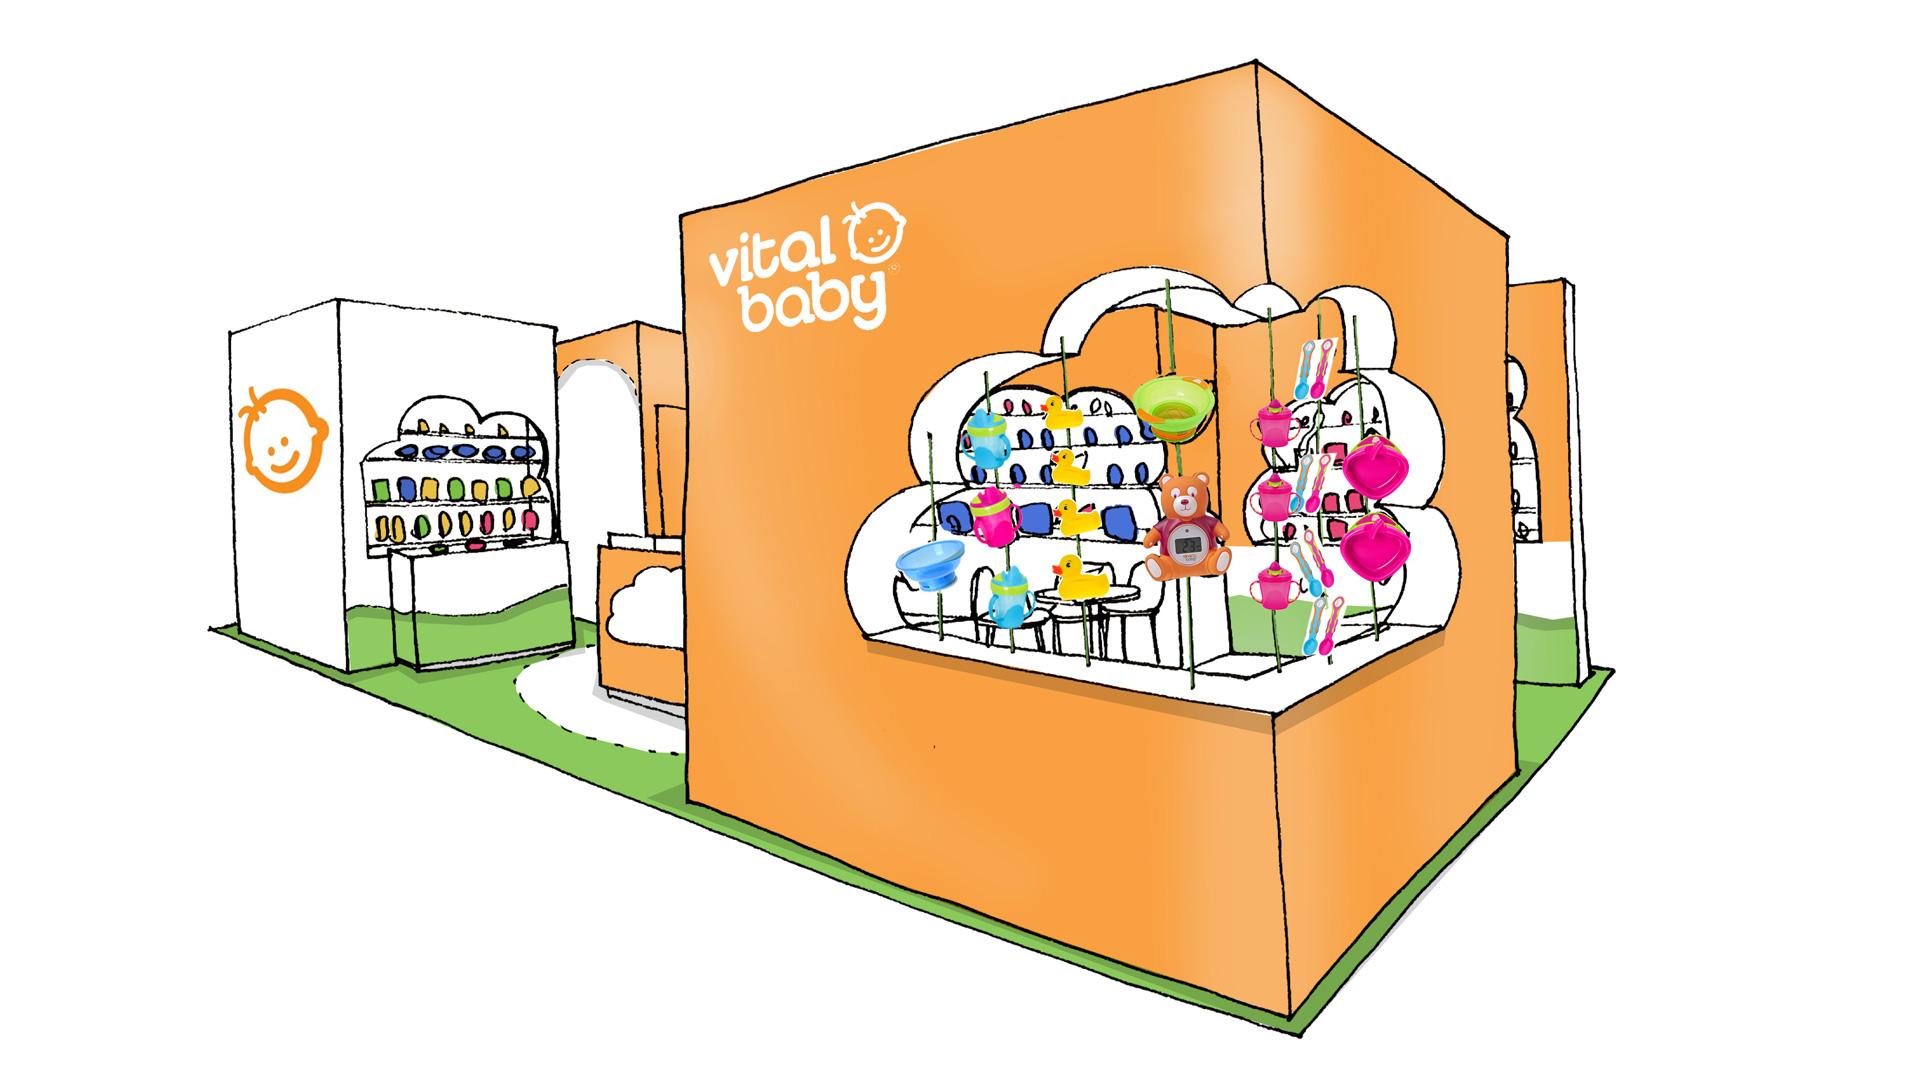 Vital Baby Booth Visual